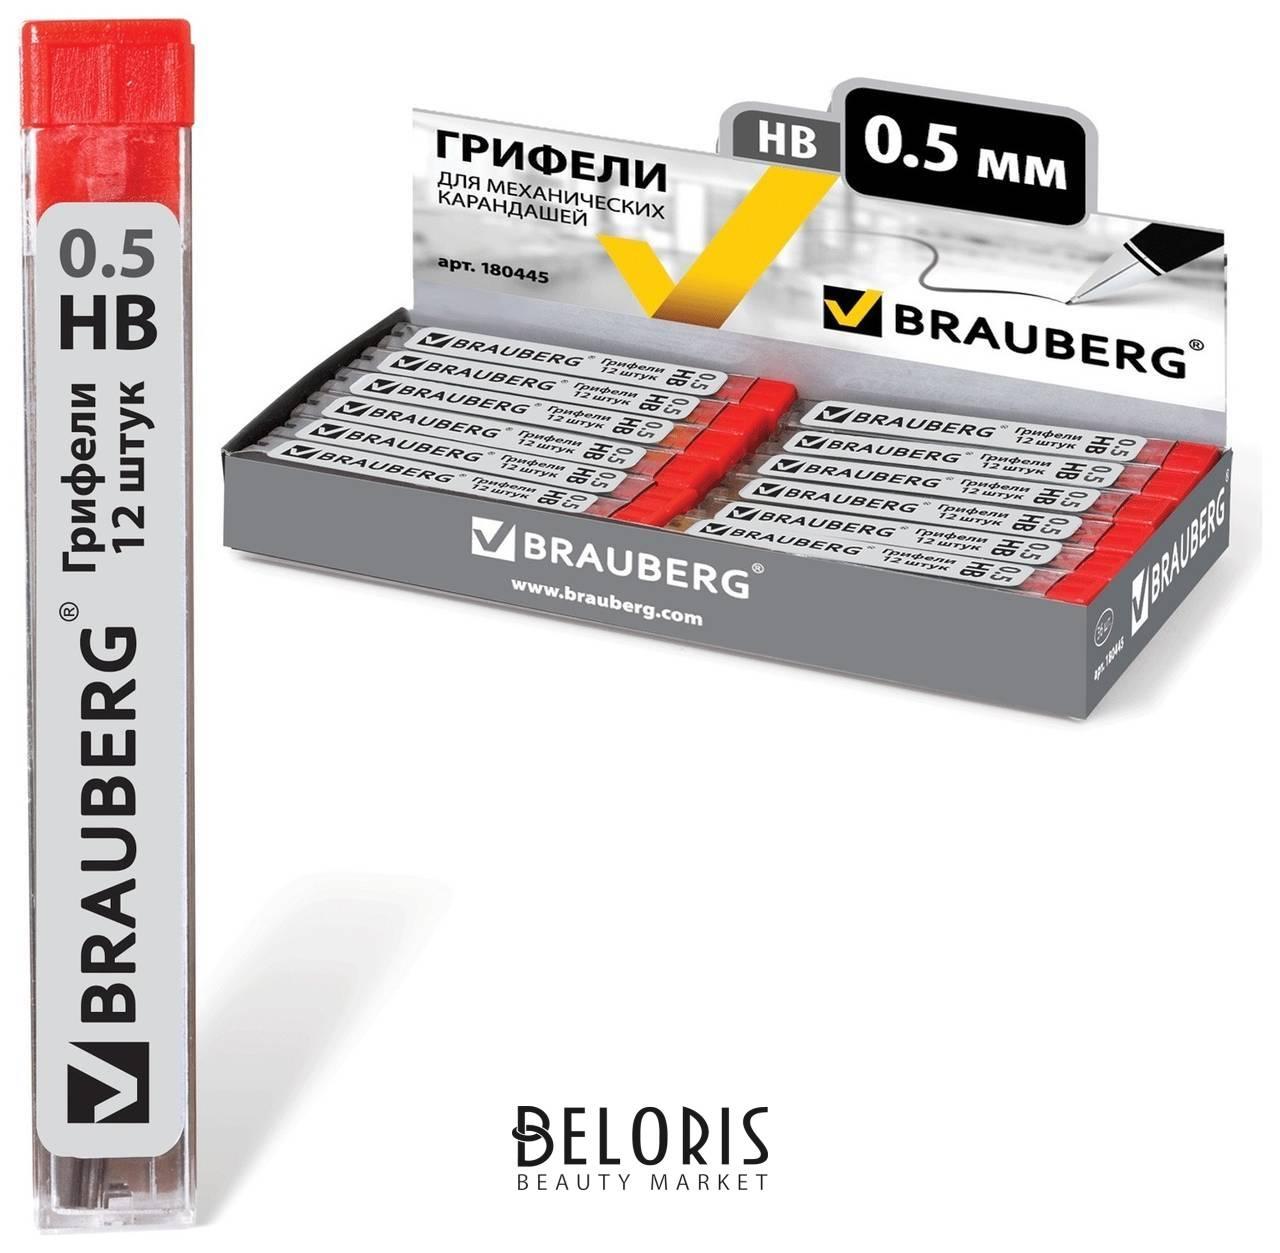 Грифели запасные Brauberg, комплект 12 шт., Hi-polymer, HB, 0,5 мм Brauberg